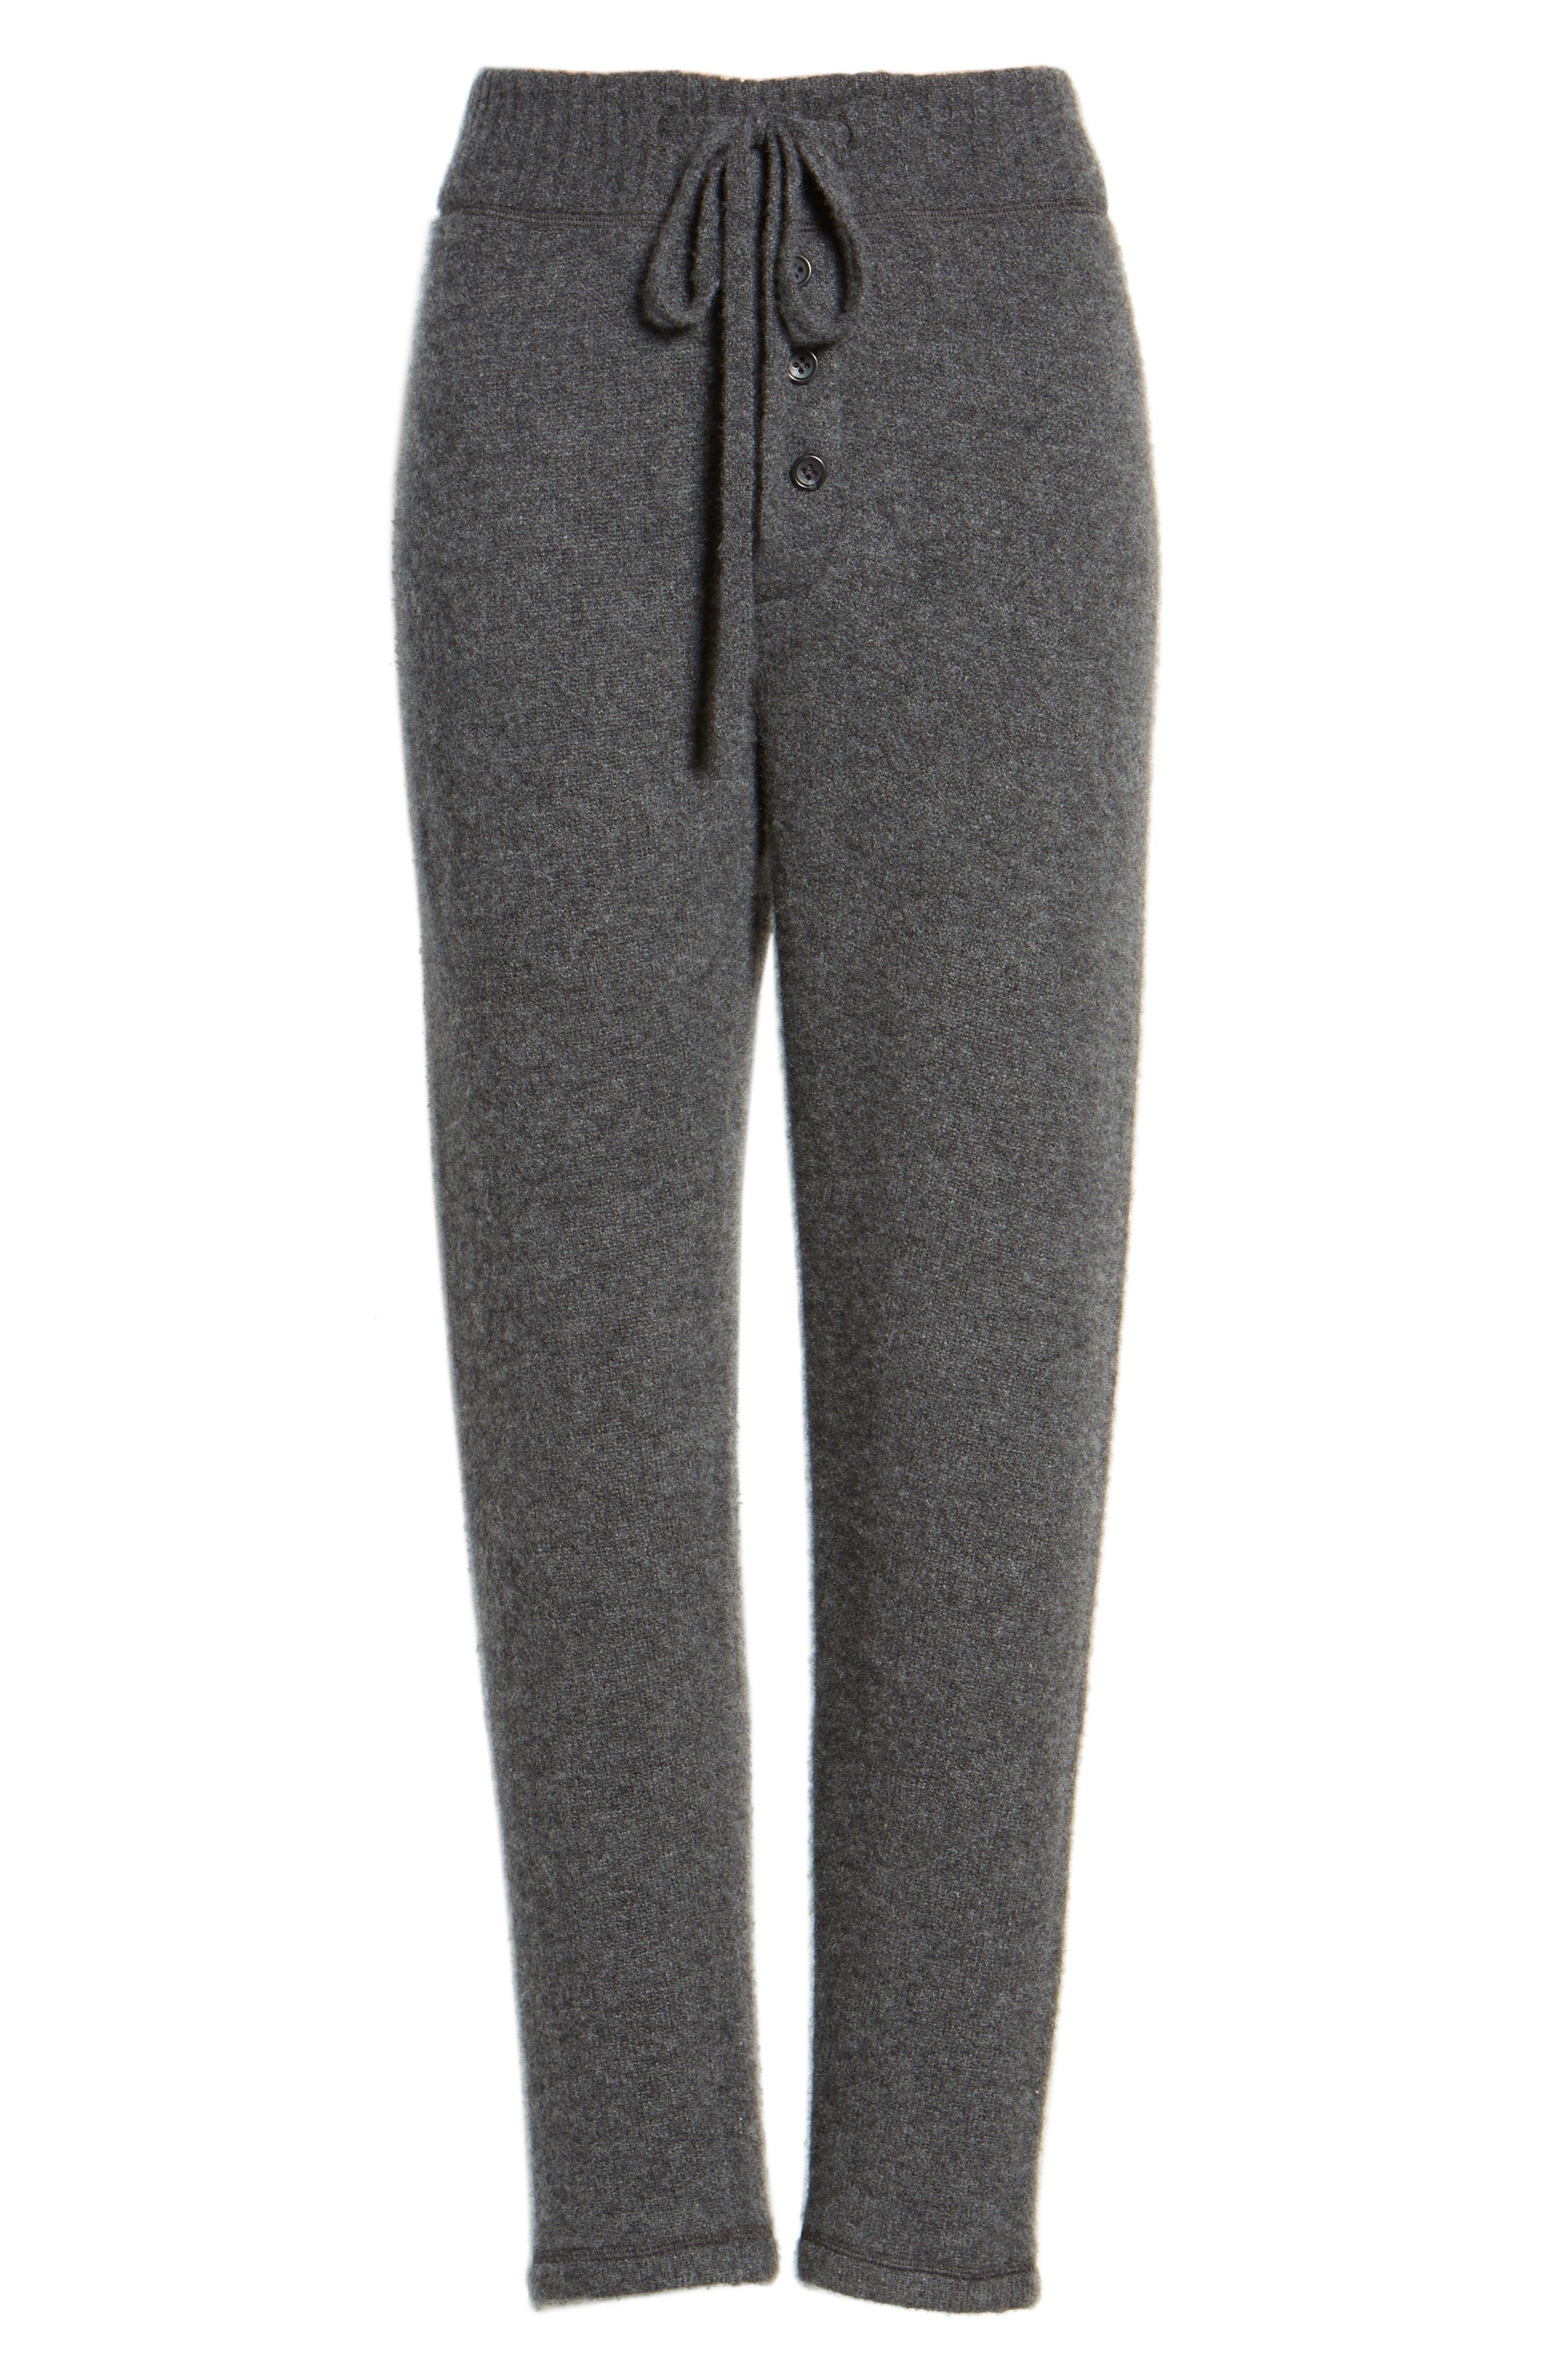 Brushed Cashmere Sweatpants,                             Alternate thumbnail 6, color,                             Charcoal